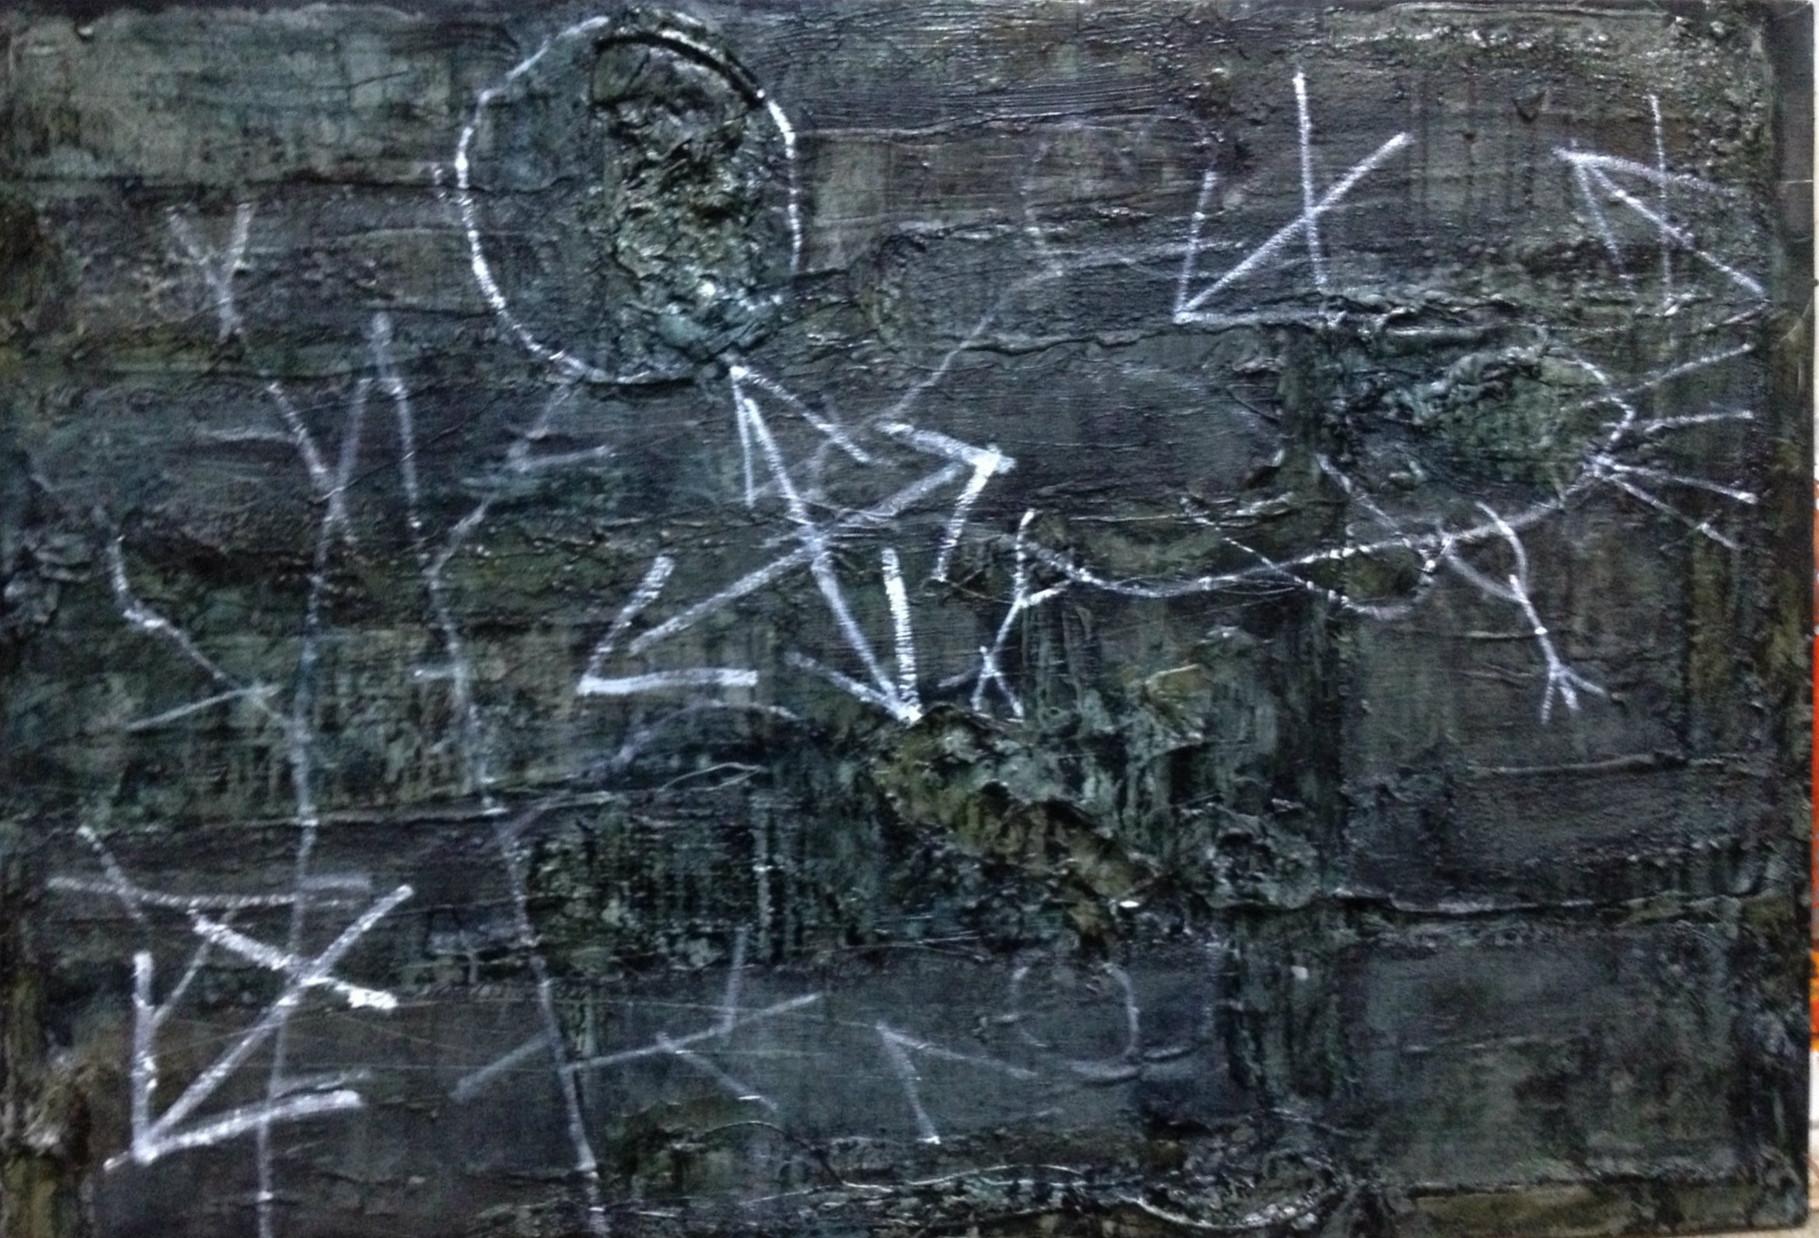 Катерина Поединщикова.      Казаки-разбойники.     2014 г.    Холст, масло.   100х80 см.